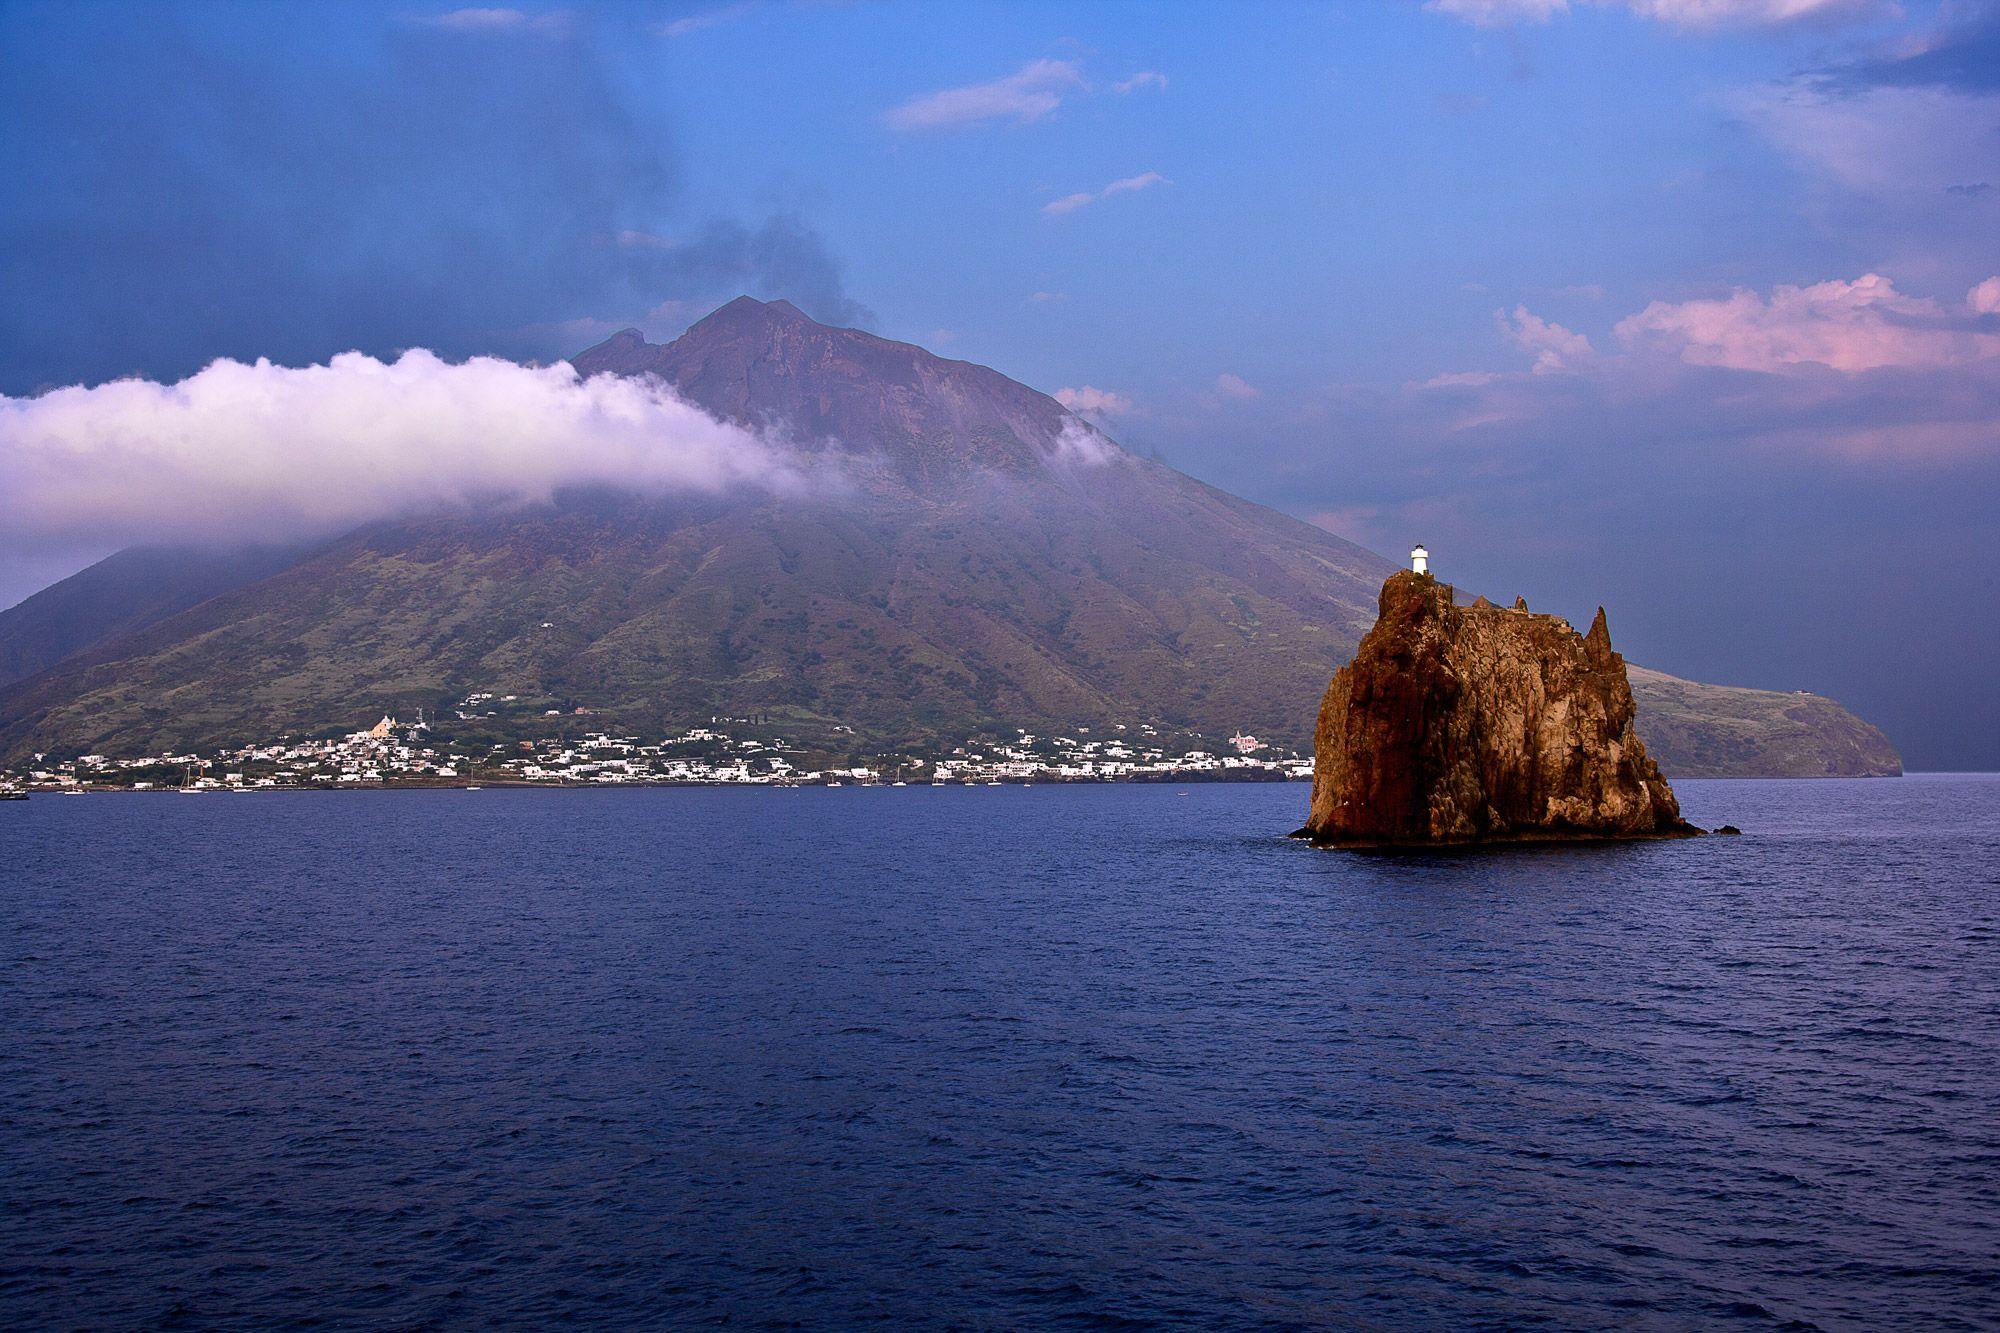 stromboli - Buscar con Google | Lipari, Aeolian islands